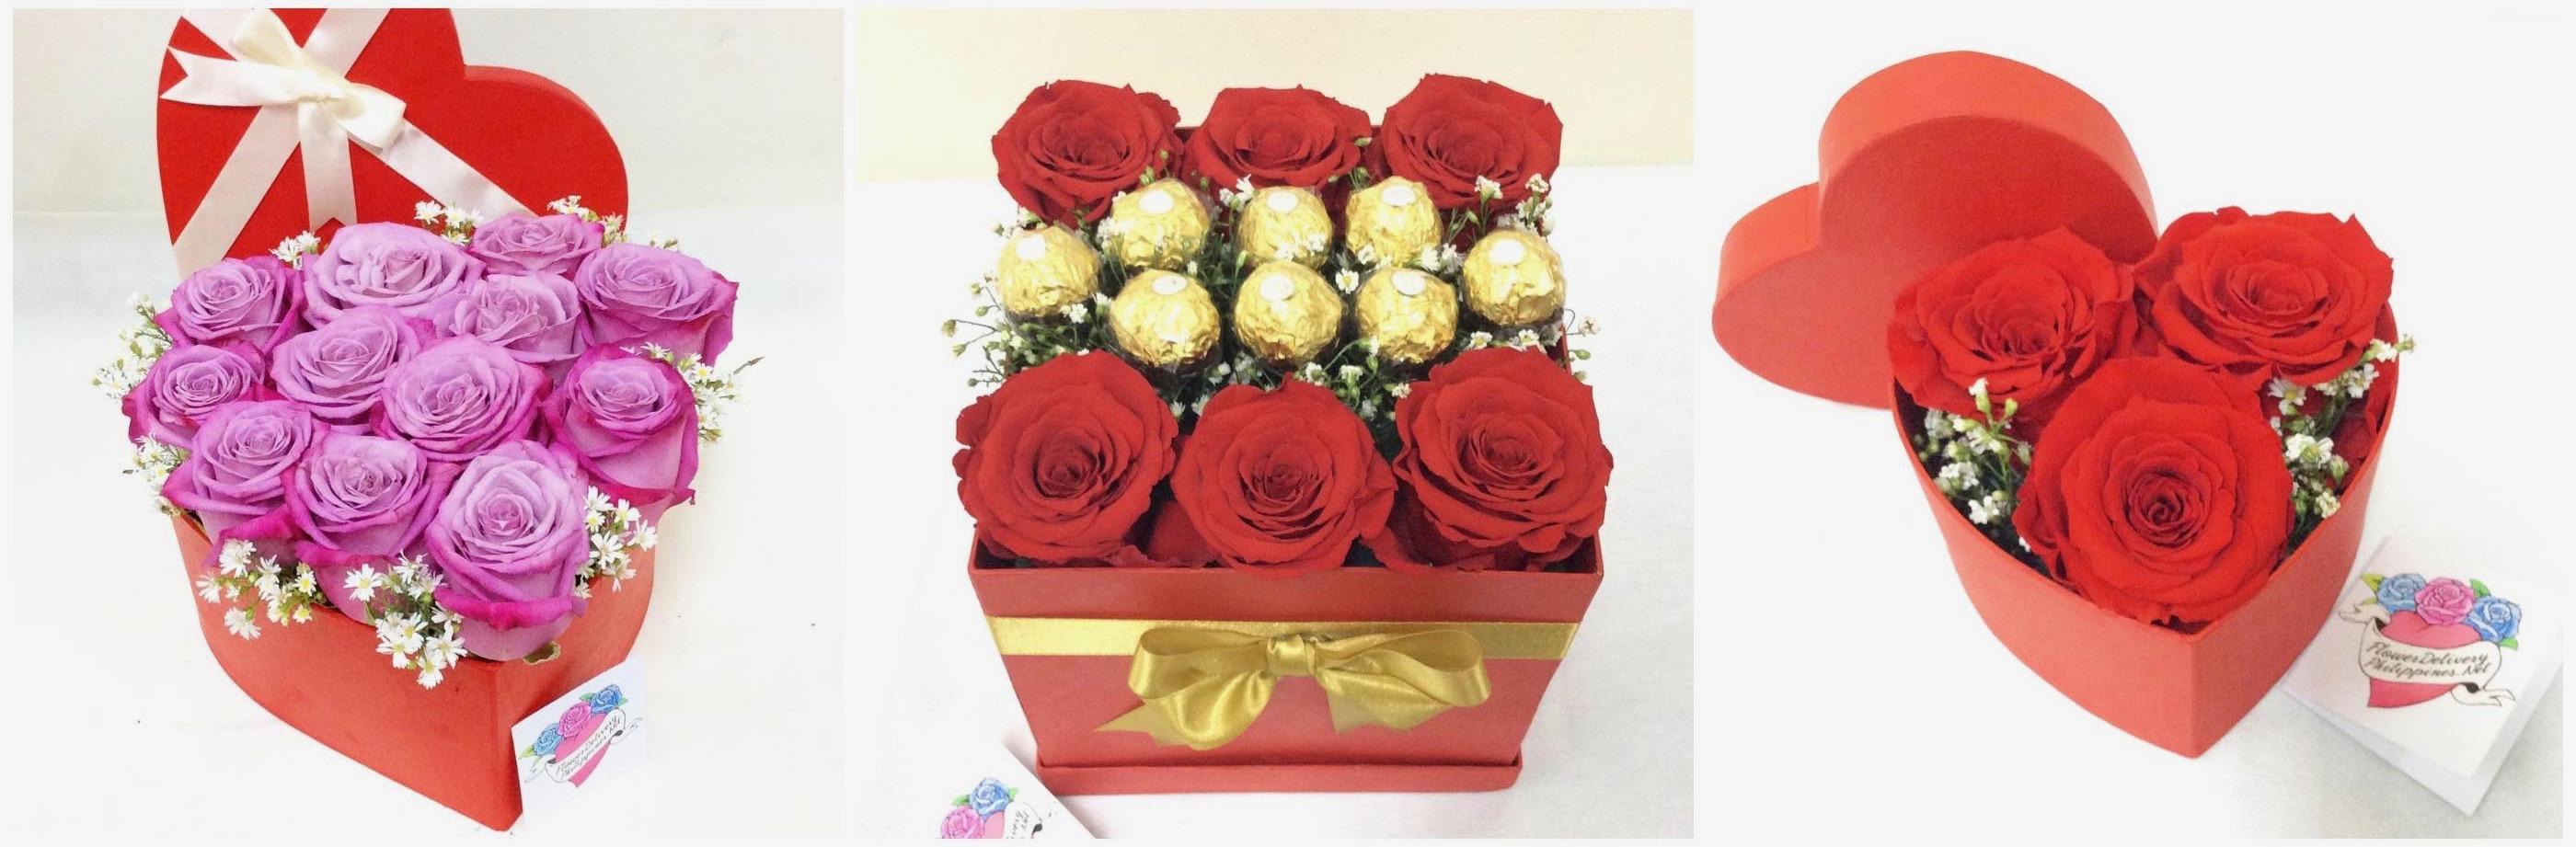 Boxed Ecuadorian Roses Manila